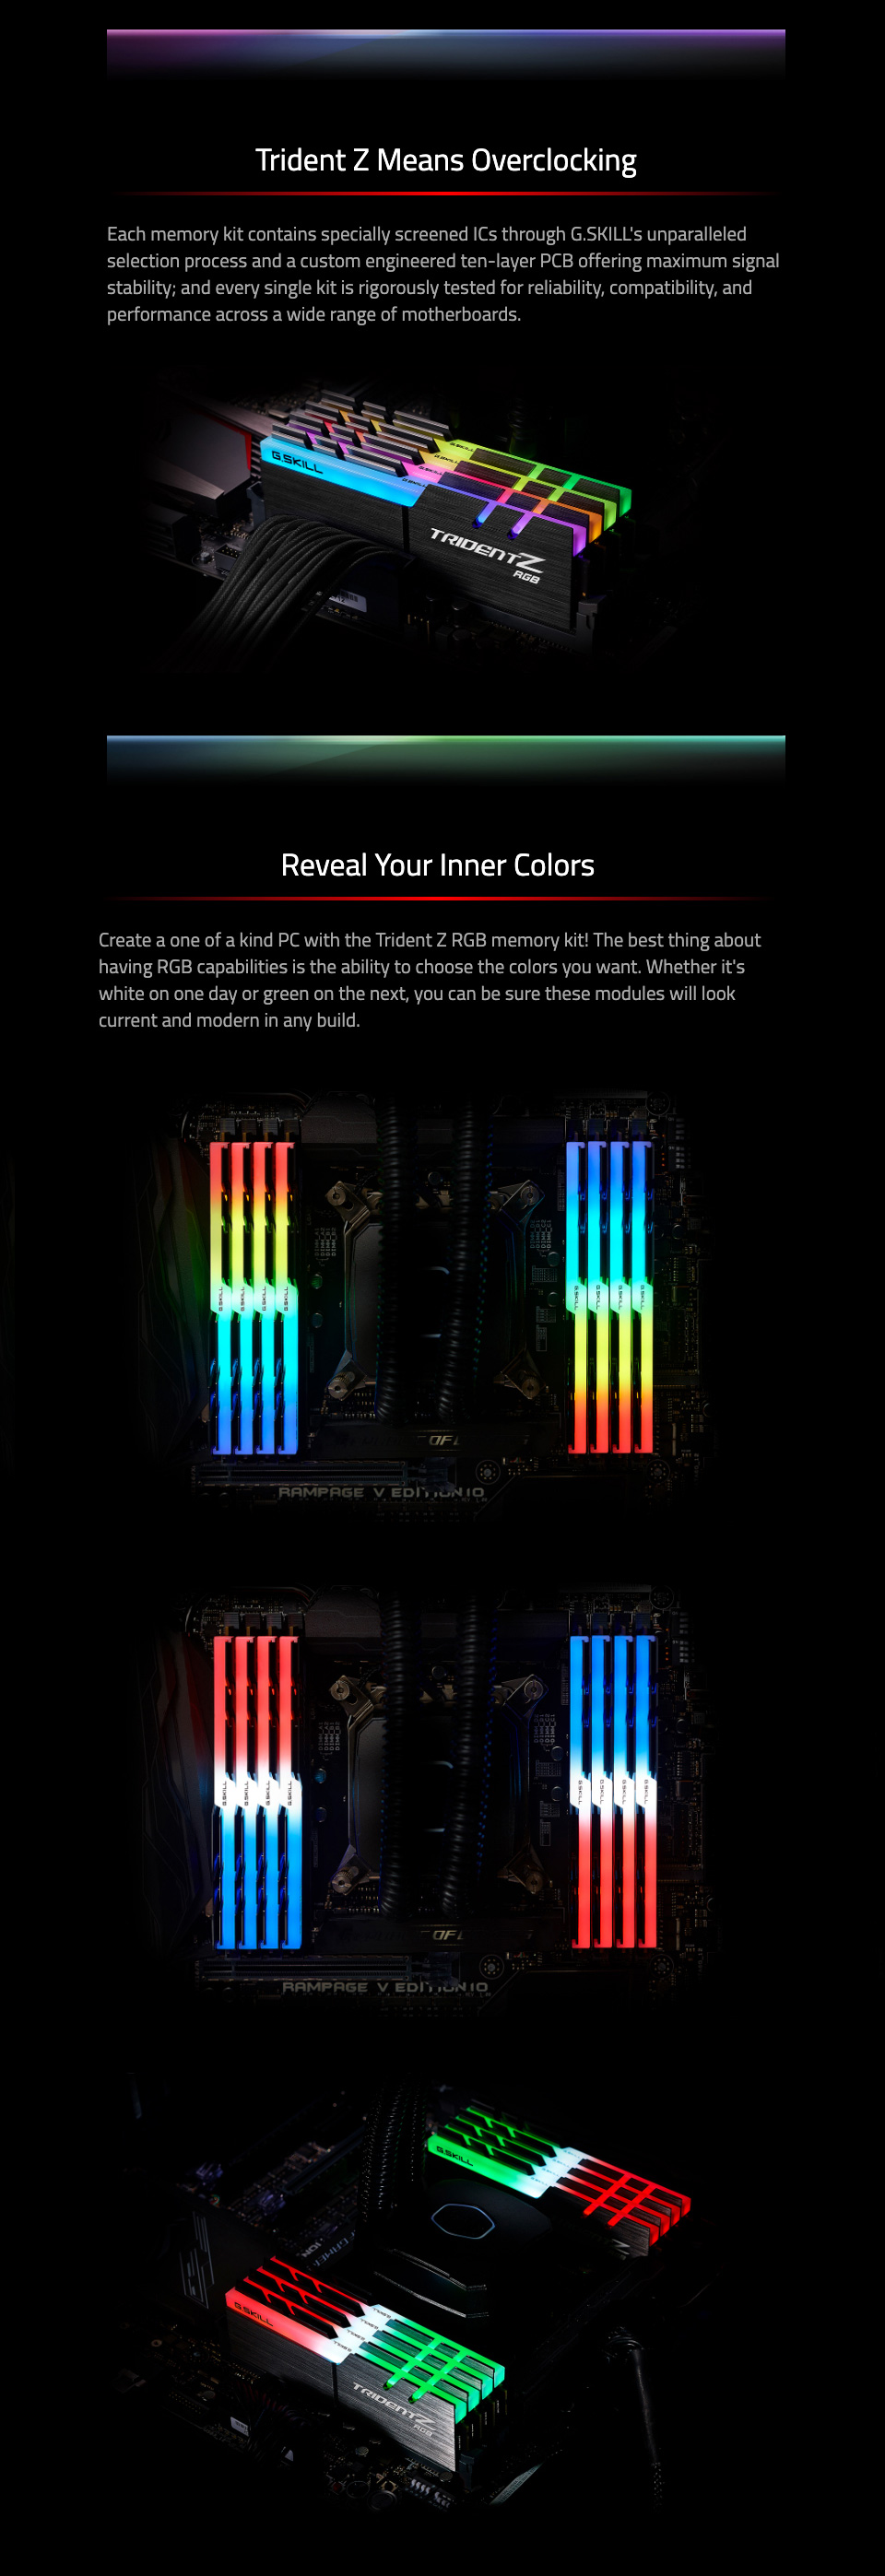 G.Skill Trident Z RGB F4-3600C16D-16GTZRC 16GB (2x8GB) DDR4 features 2